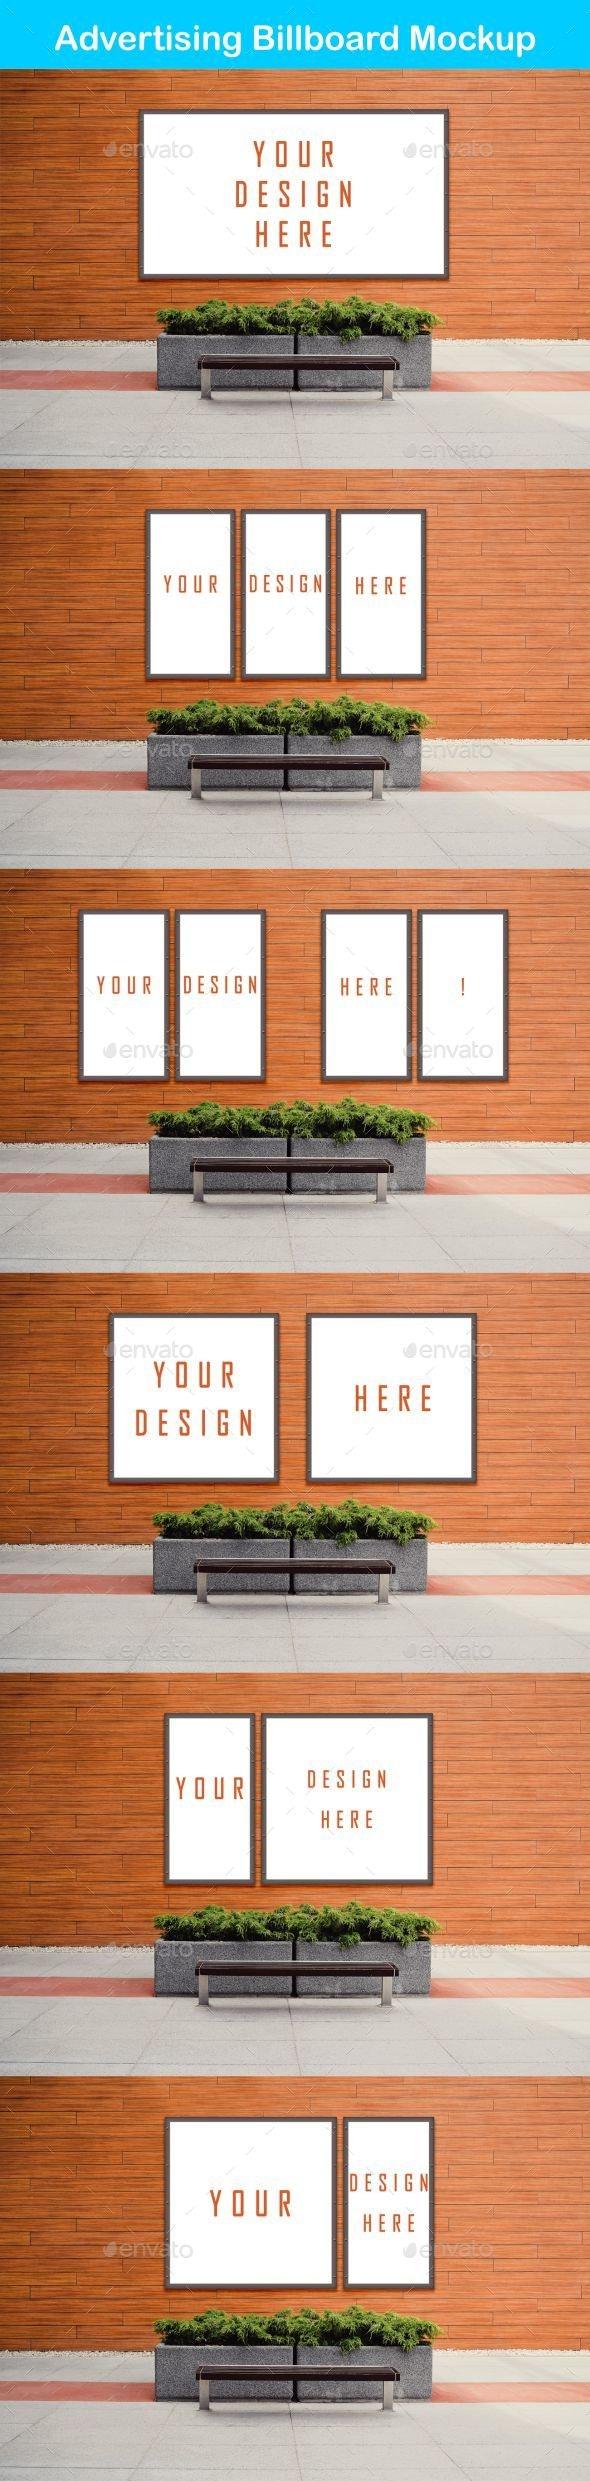 Smart Advertising Billboard Mockup PSD Template - Signage Print